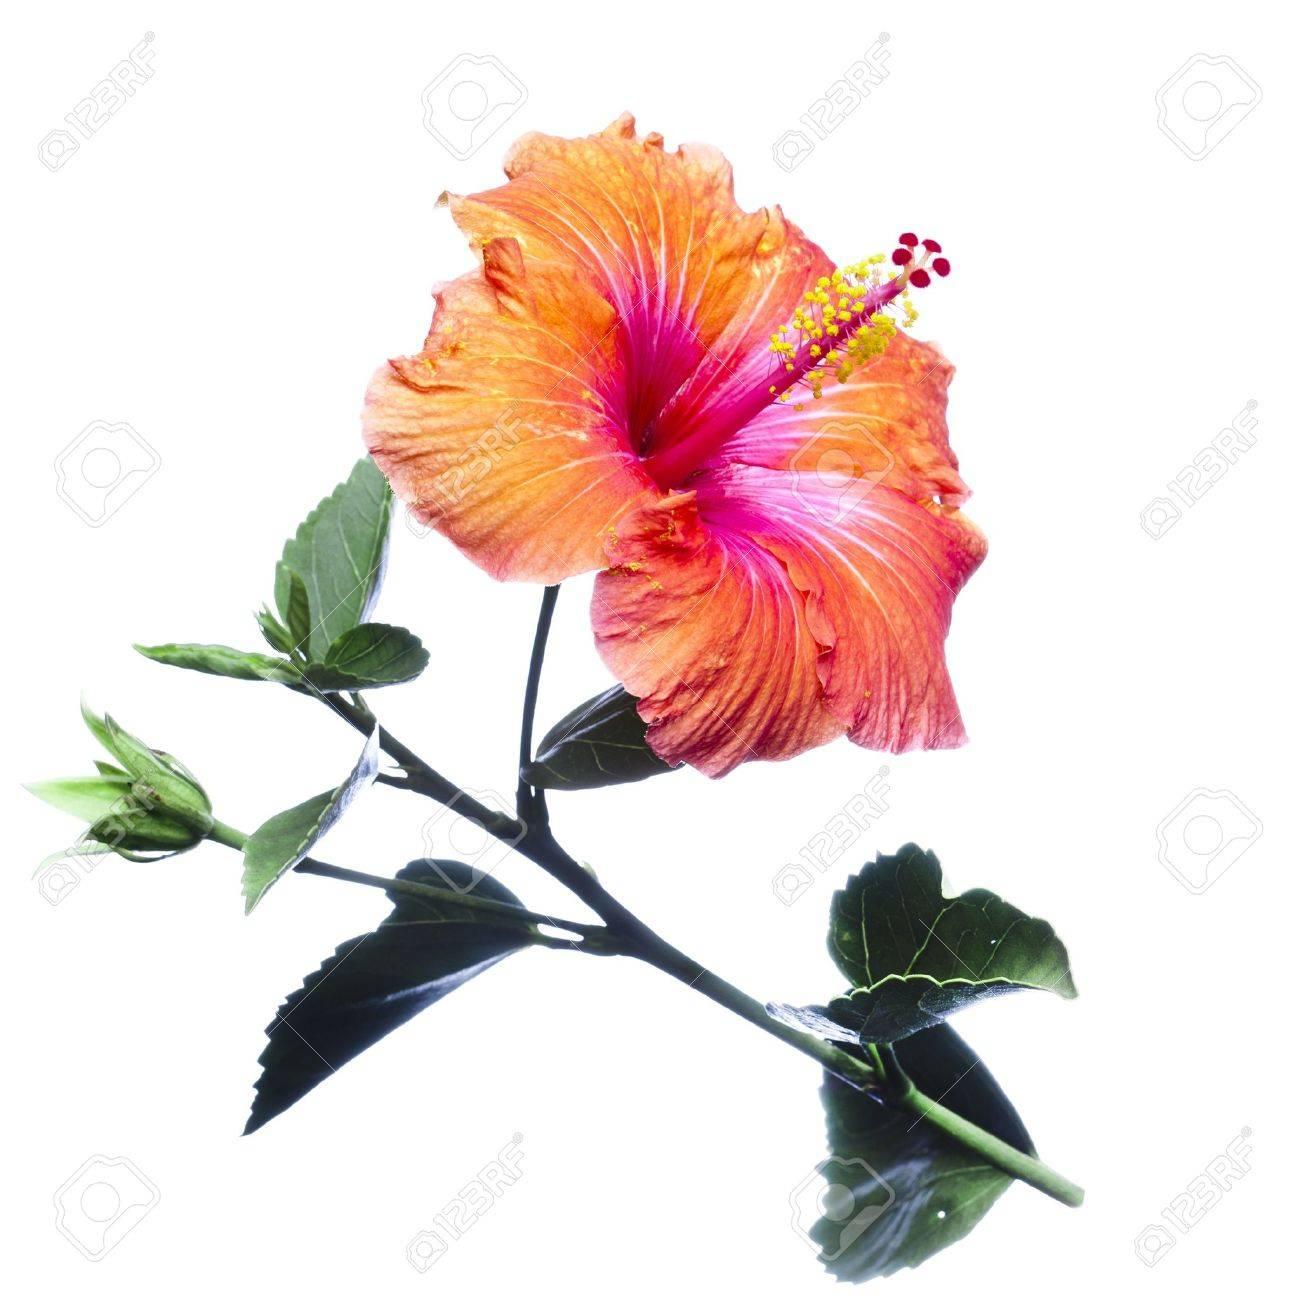 Hibiscus flowers - 12652937